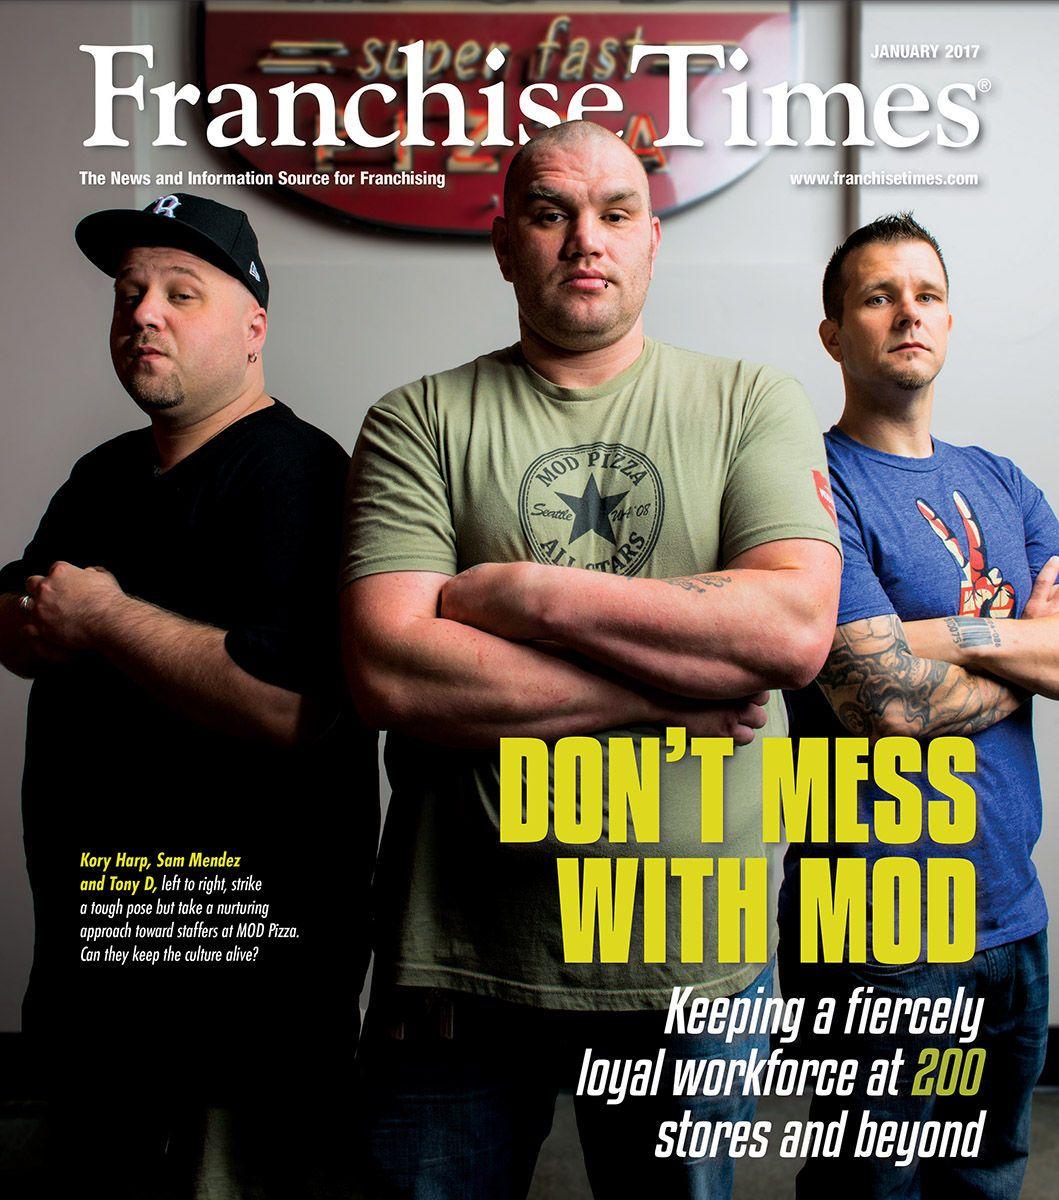 1franchisetimes_modpizza_cover_jan2017_seattleeditorialphotographer_danielberman_web1